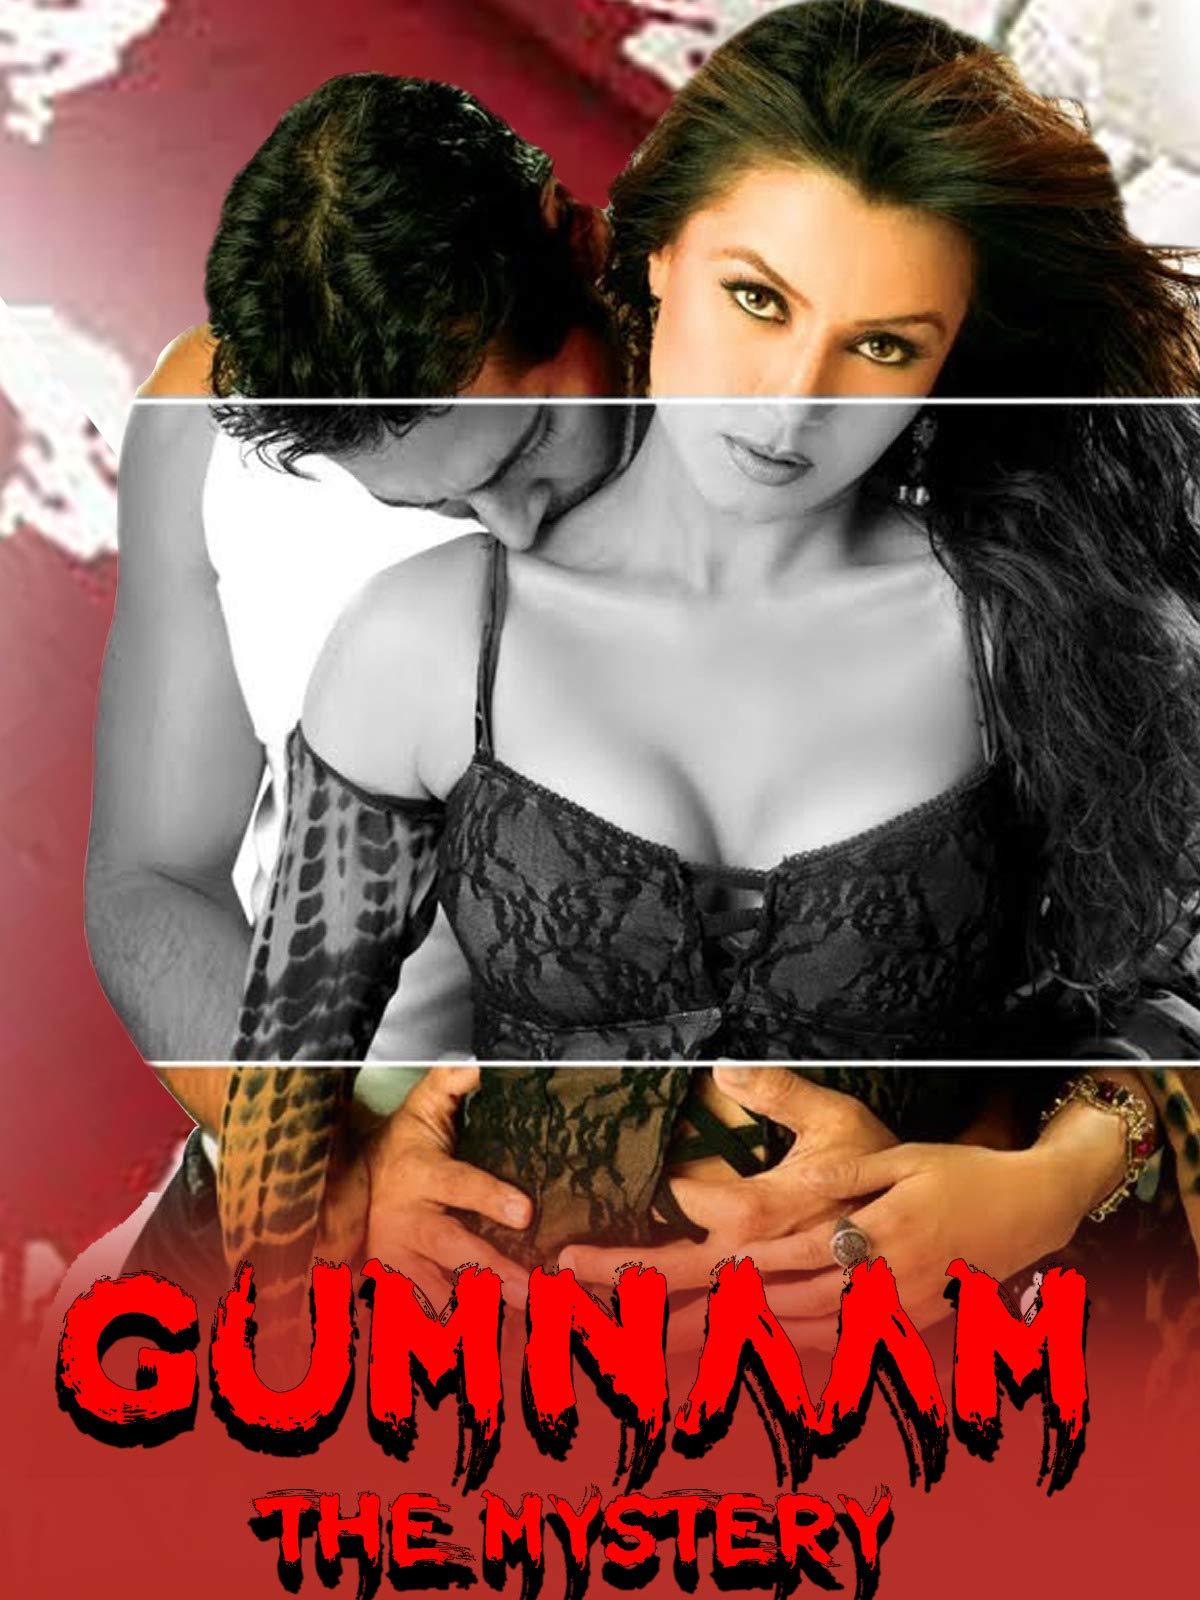 Gumnaam The Mystery 2008 Hindi 300MB AMZN HDRip 480p ESubs Download